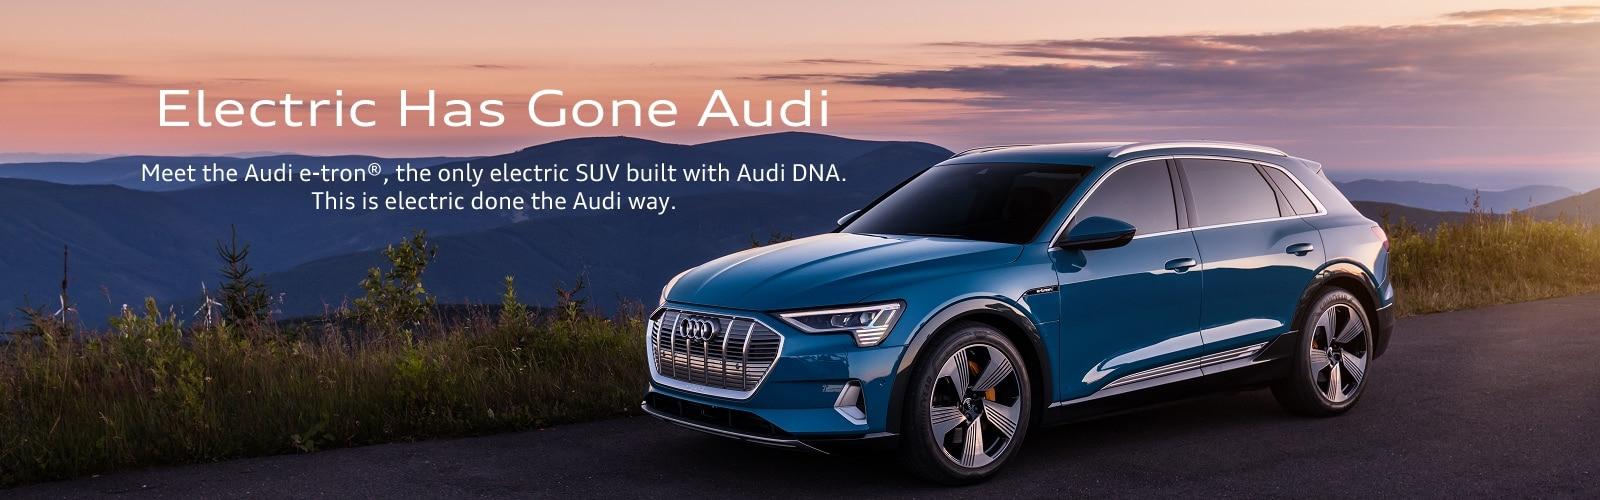 Audi Louisville New Audi Dealer Serving Louisville Lexington